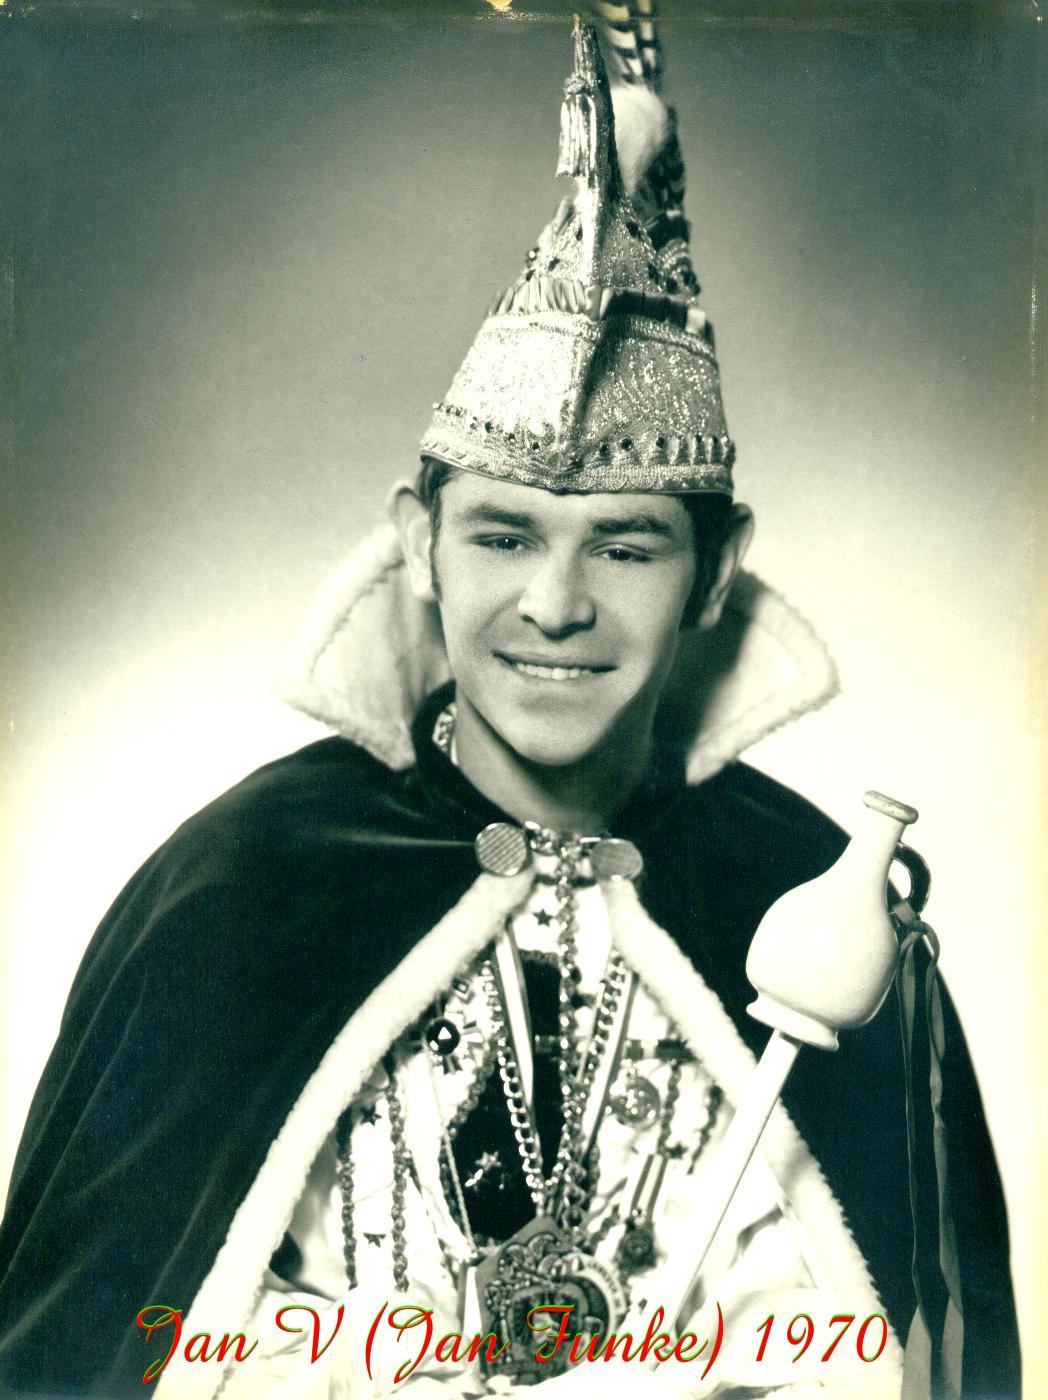 1970 Prins Jan (V) Funken